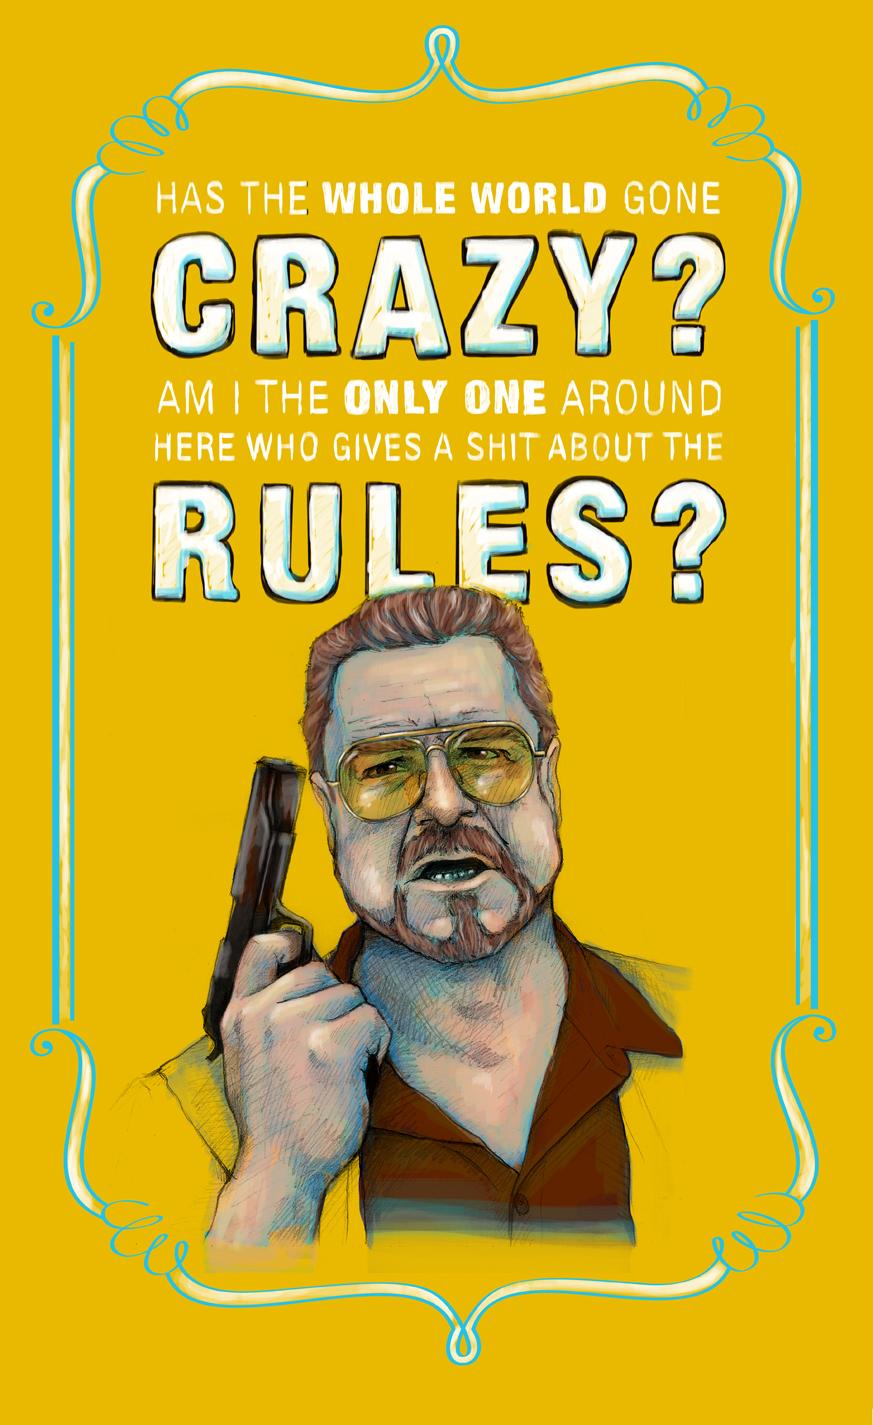 Walter_Rules_web.jpg